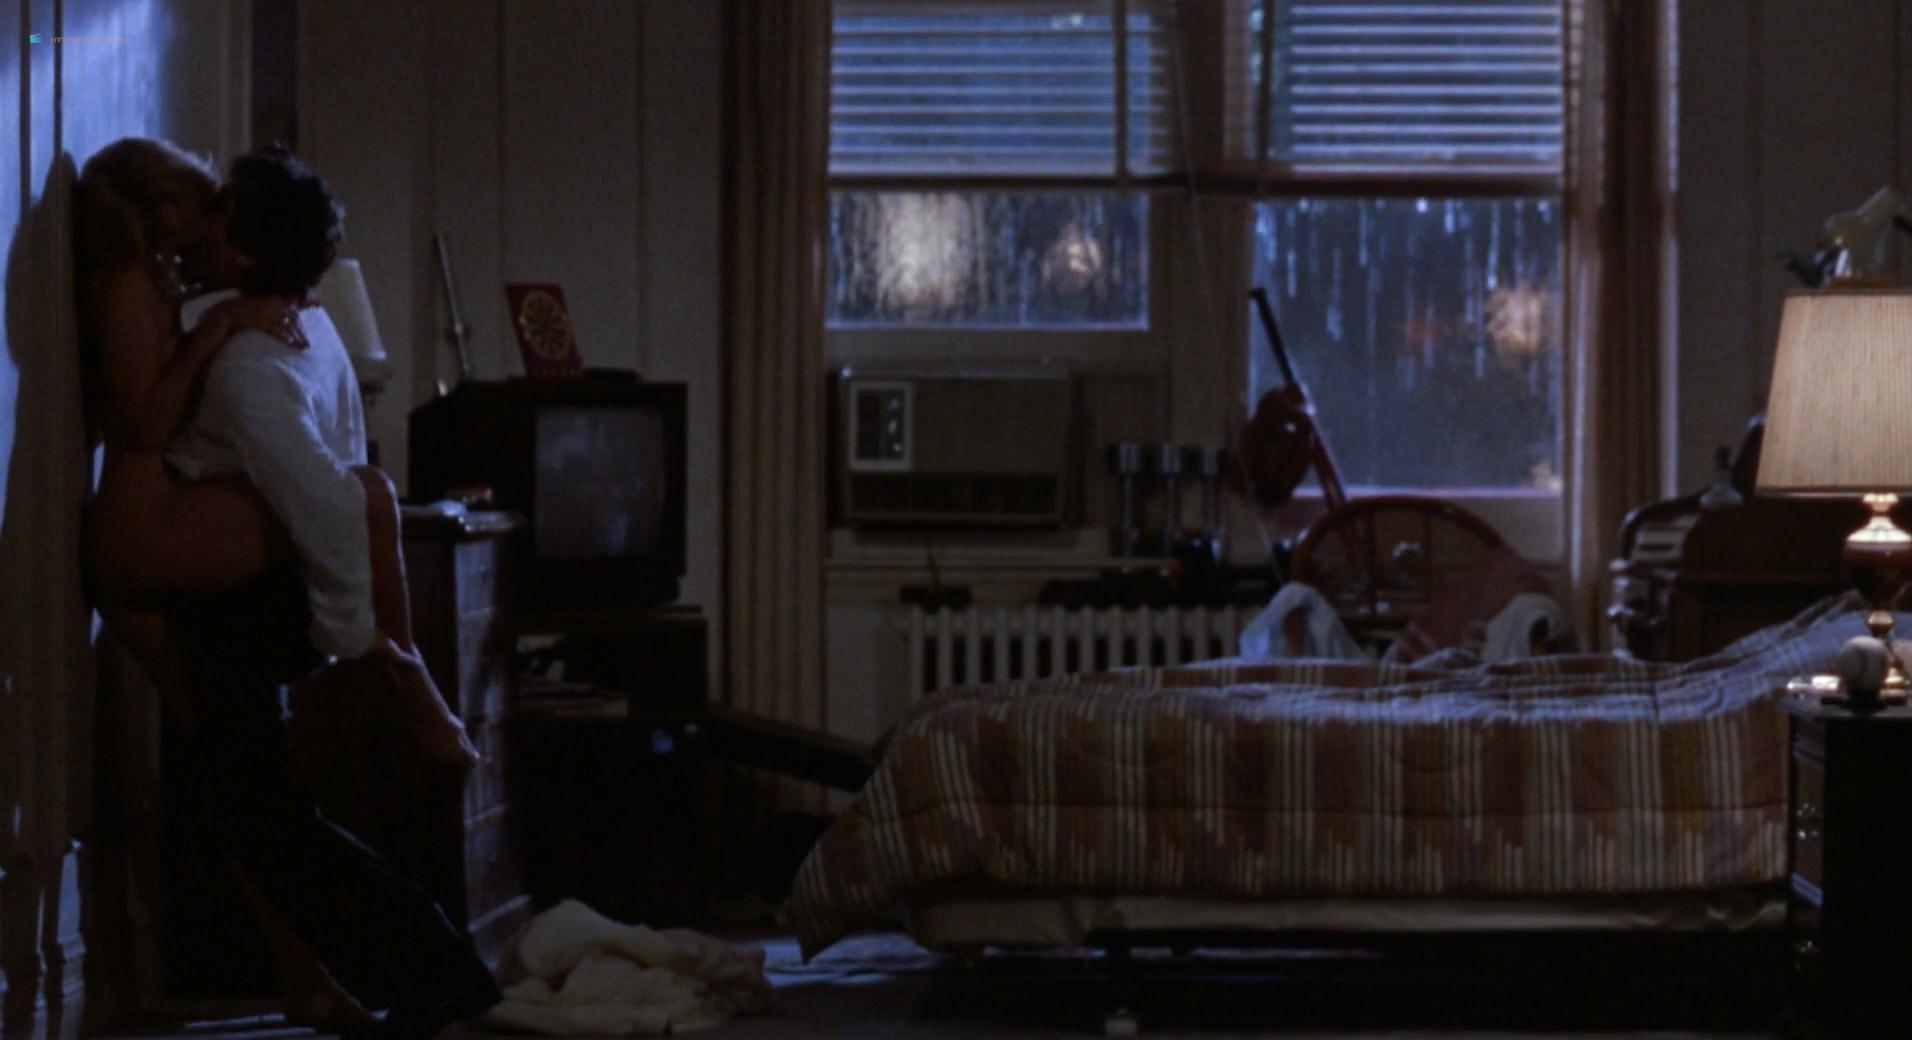 Ellen Barkin nude boobs and butt - Sea of Love (1989) HD 1080p BluRay (9)